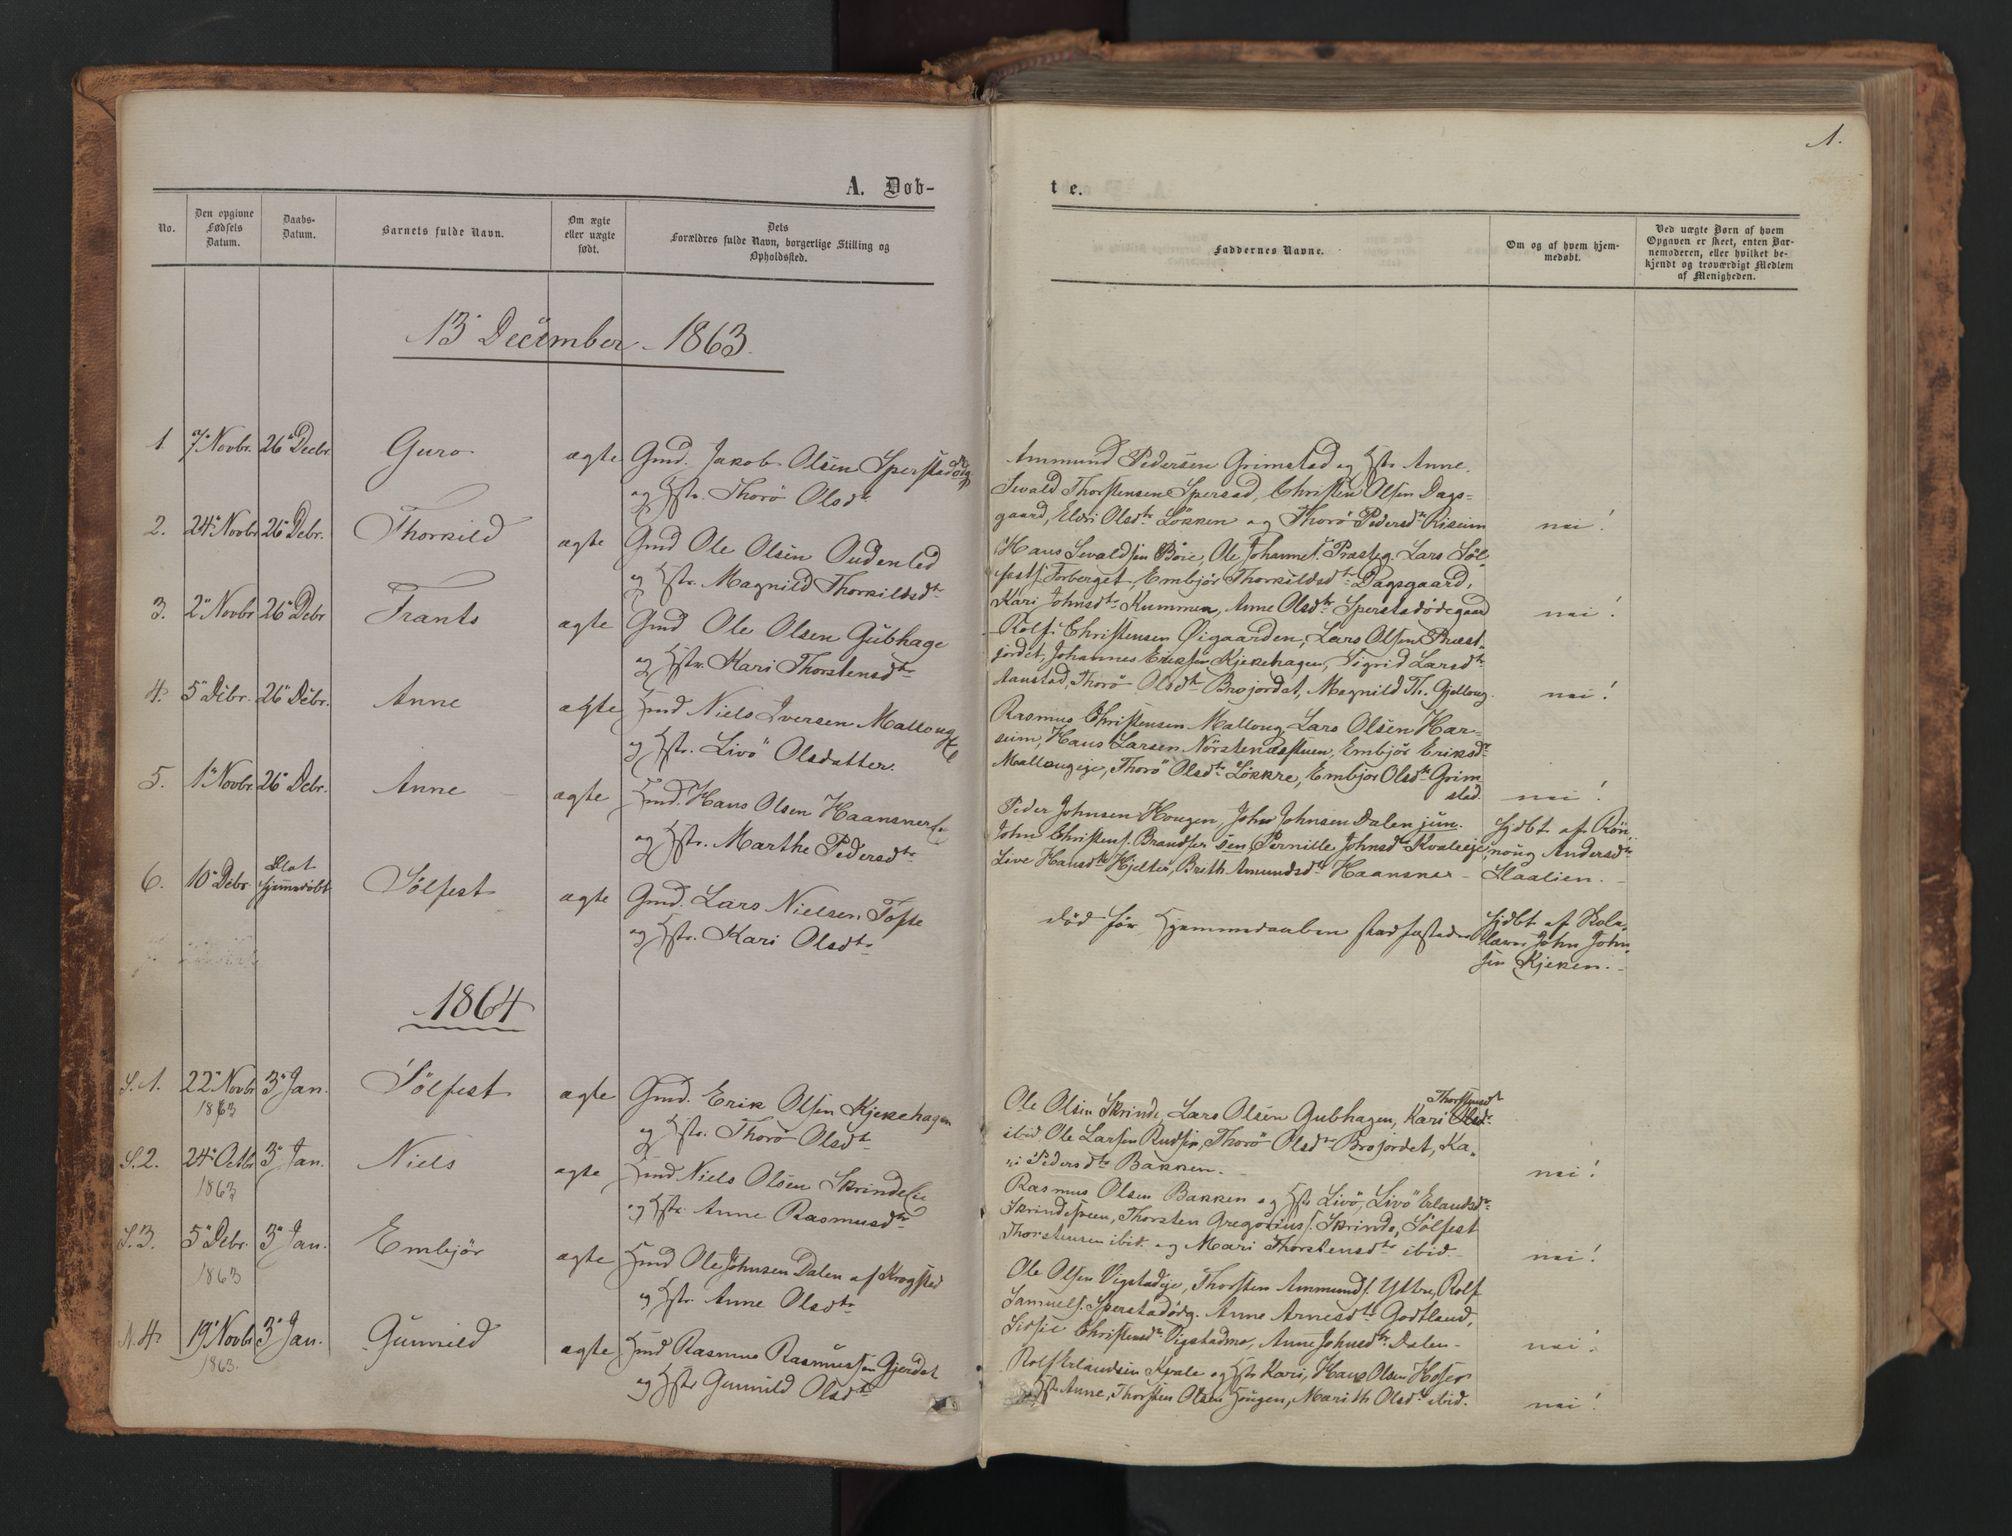 SAH, Skjåk prestekontor, Ministerialbok nr. 1, 1863-1879, s. 1